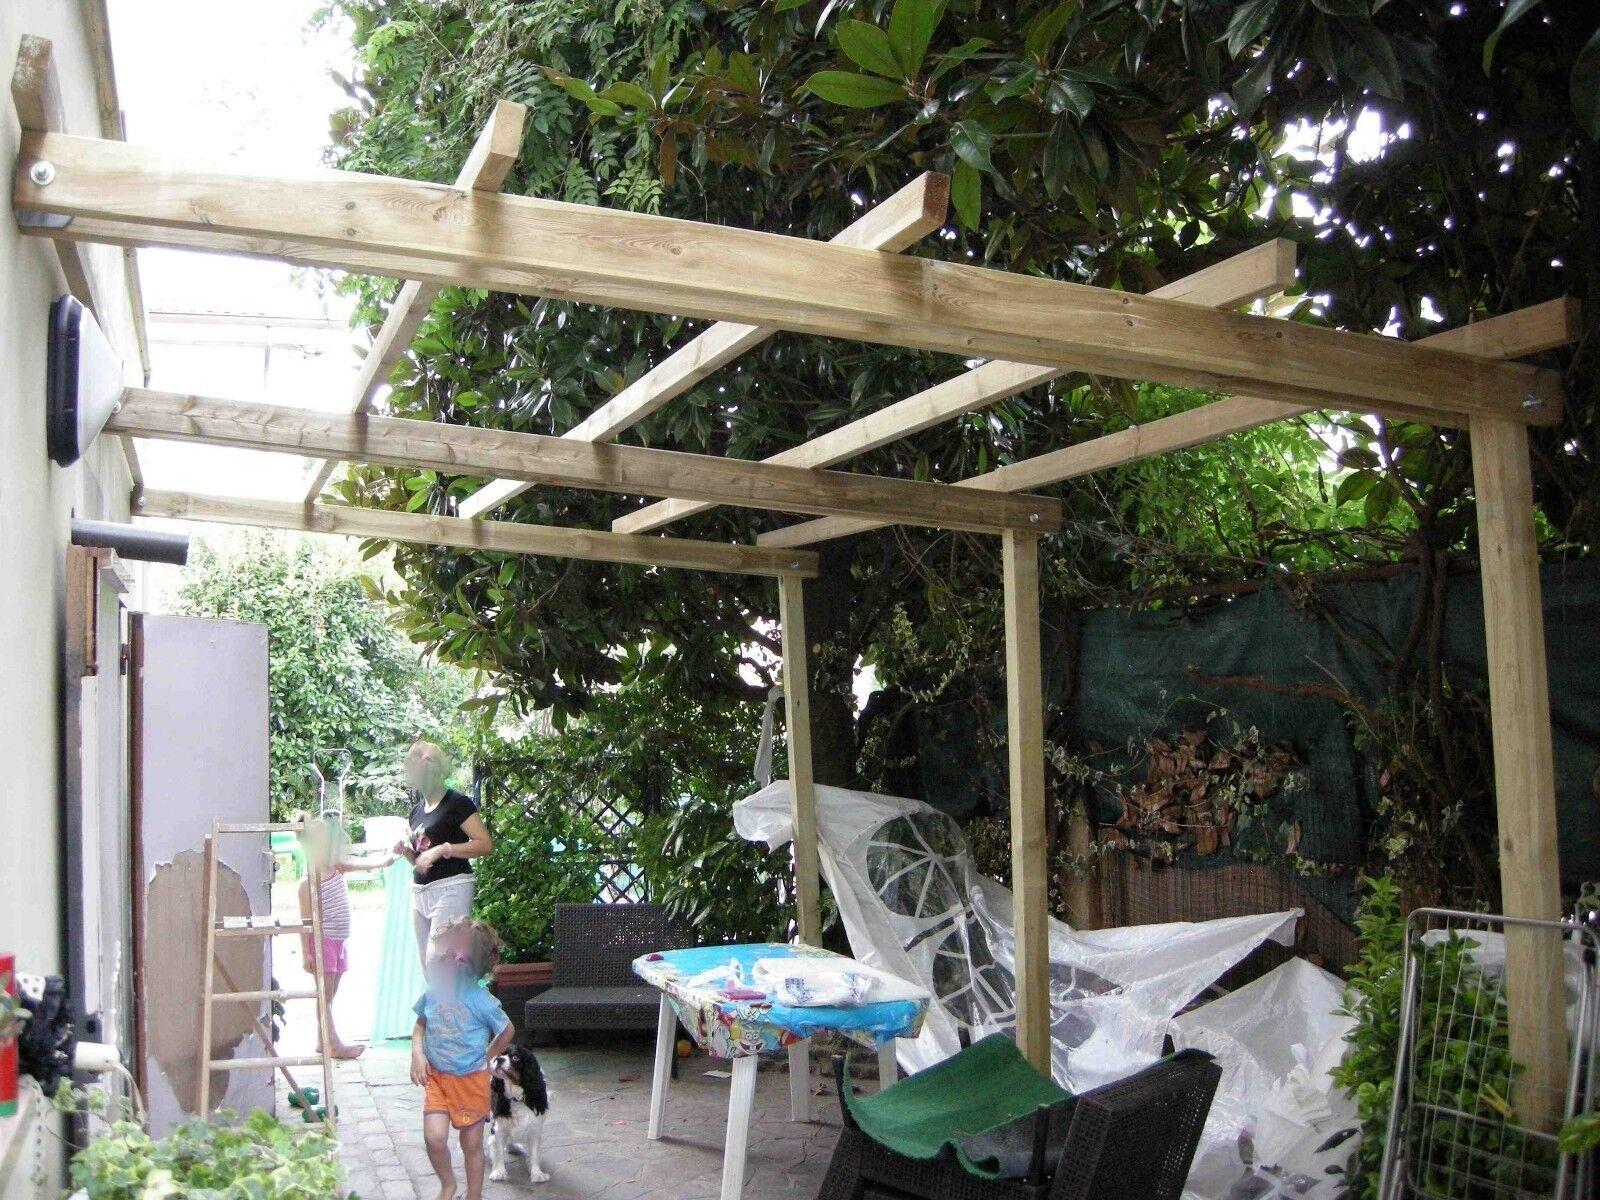 Pergola addossata in legno 5x4 mt copertura tettoia gazebo - Pergola da giardino ...